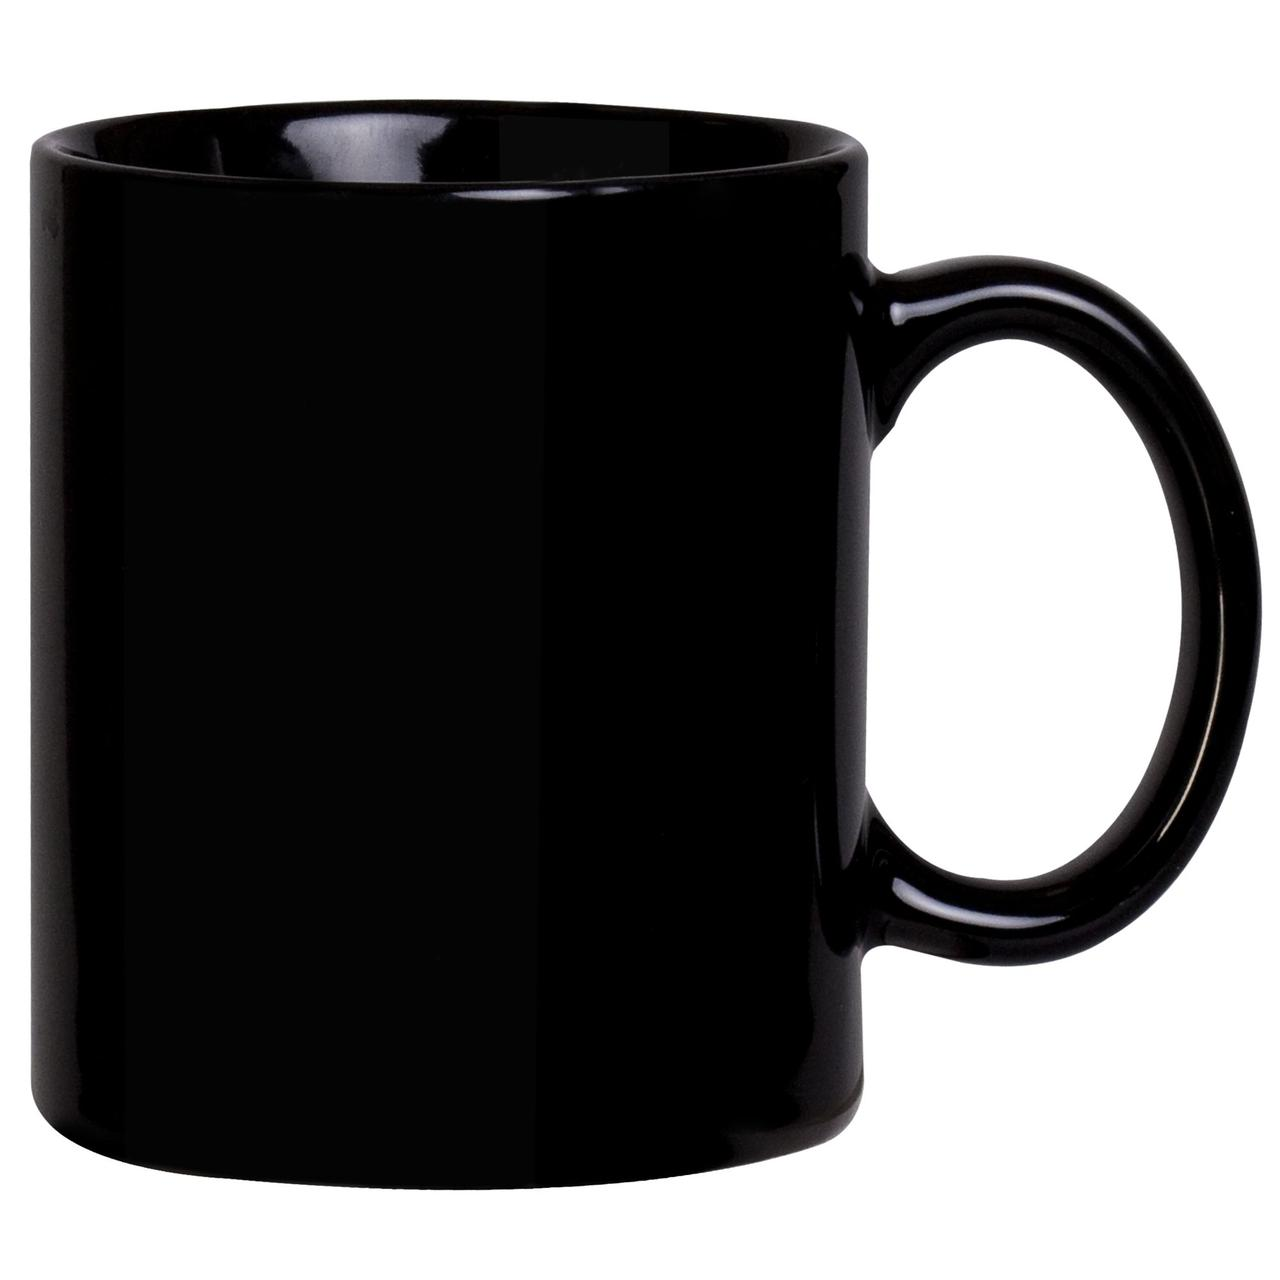 Кружка Promo, черная (артикул 4534.30)